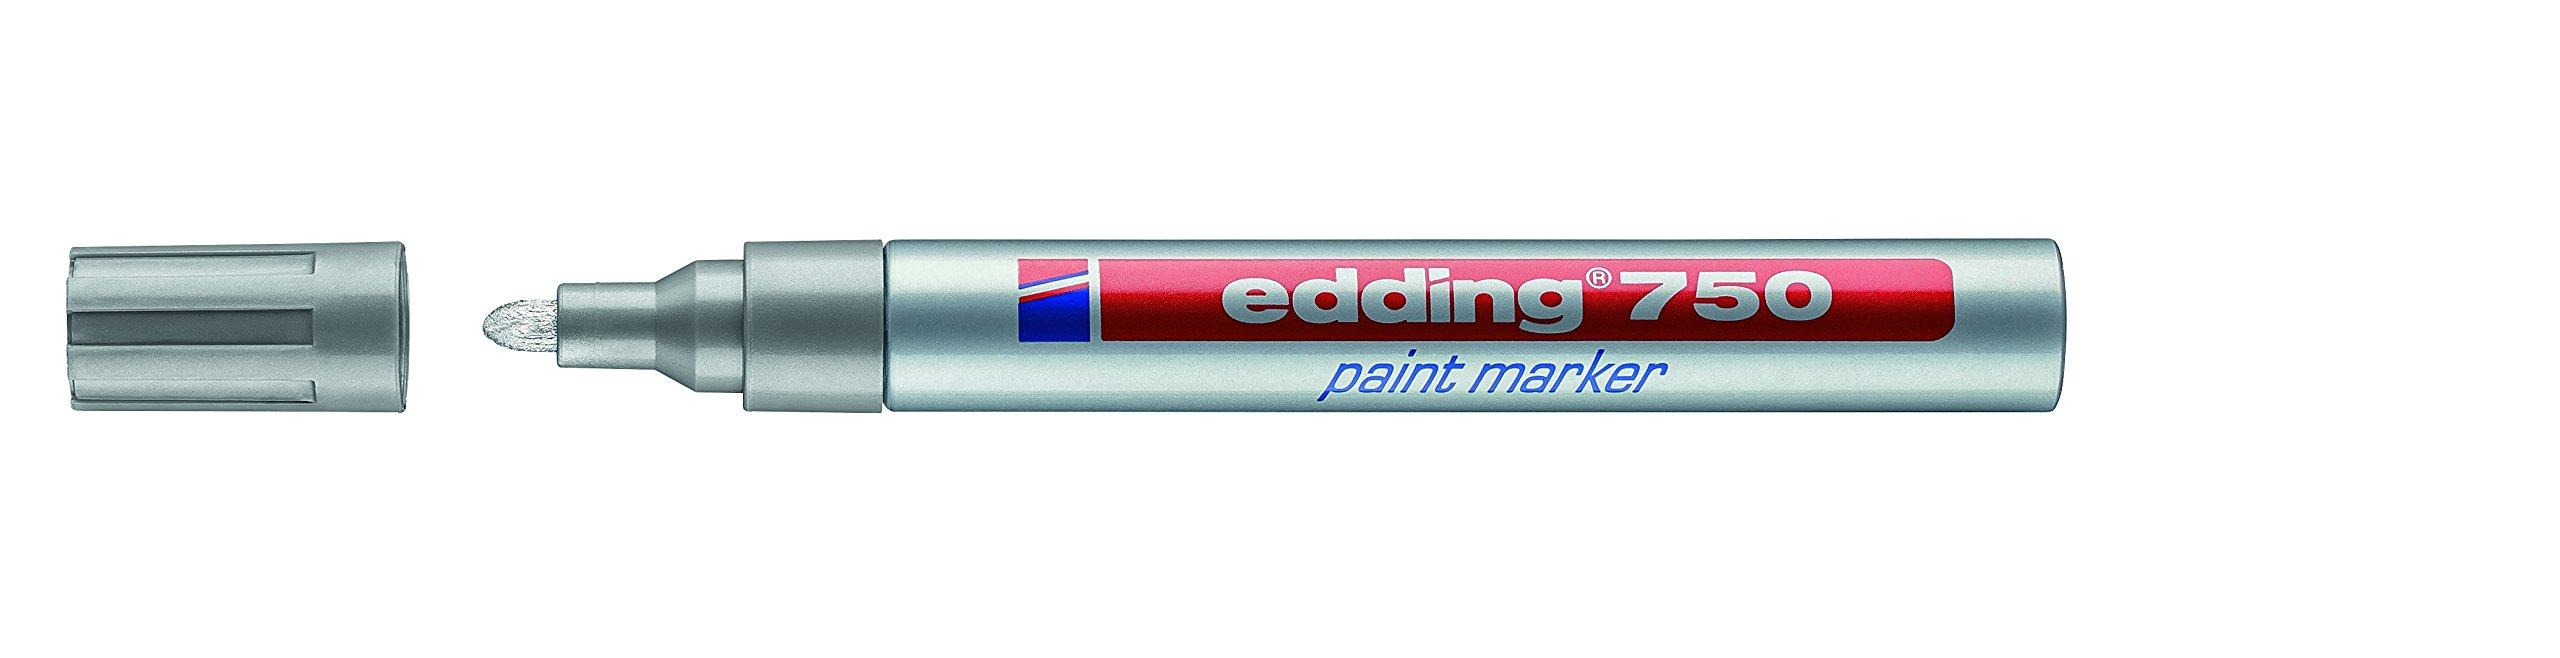 Edding 750 Silver 10pc(s) Paint Marker by edding